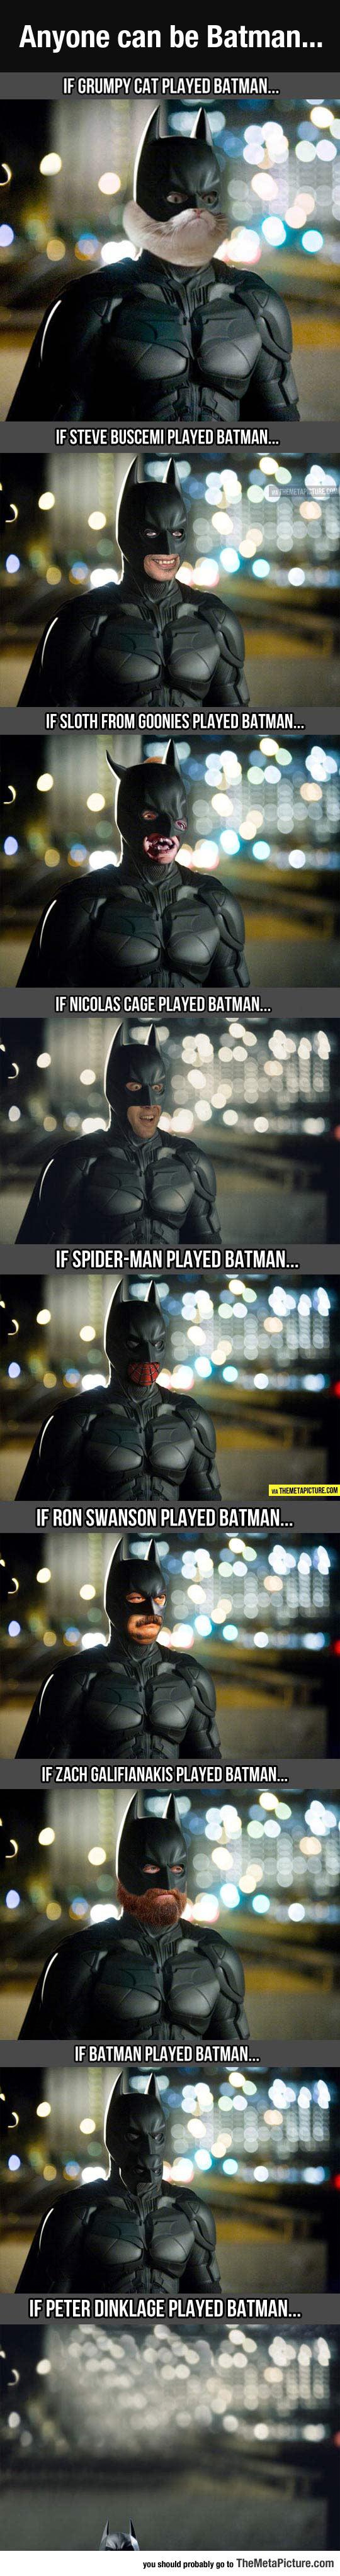 When Anyone Can Be Batman